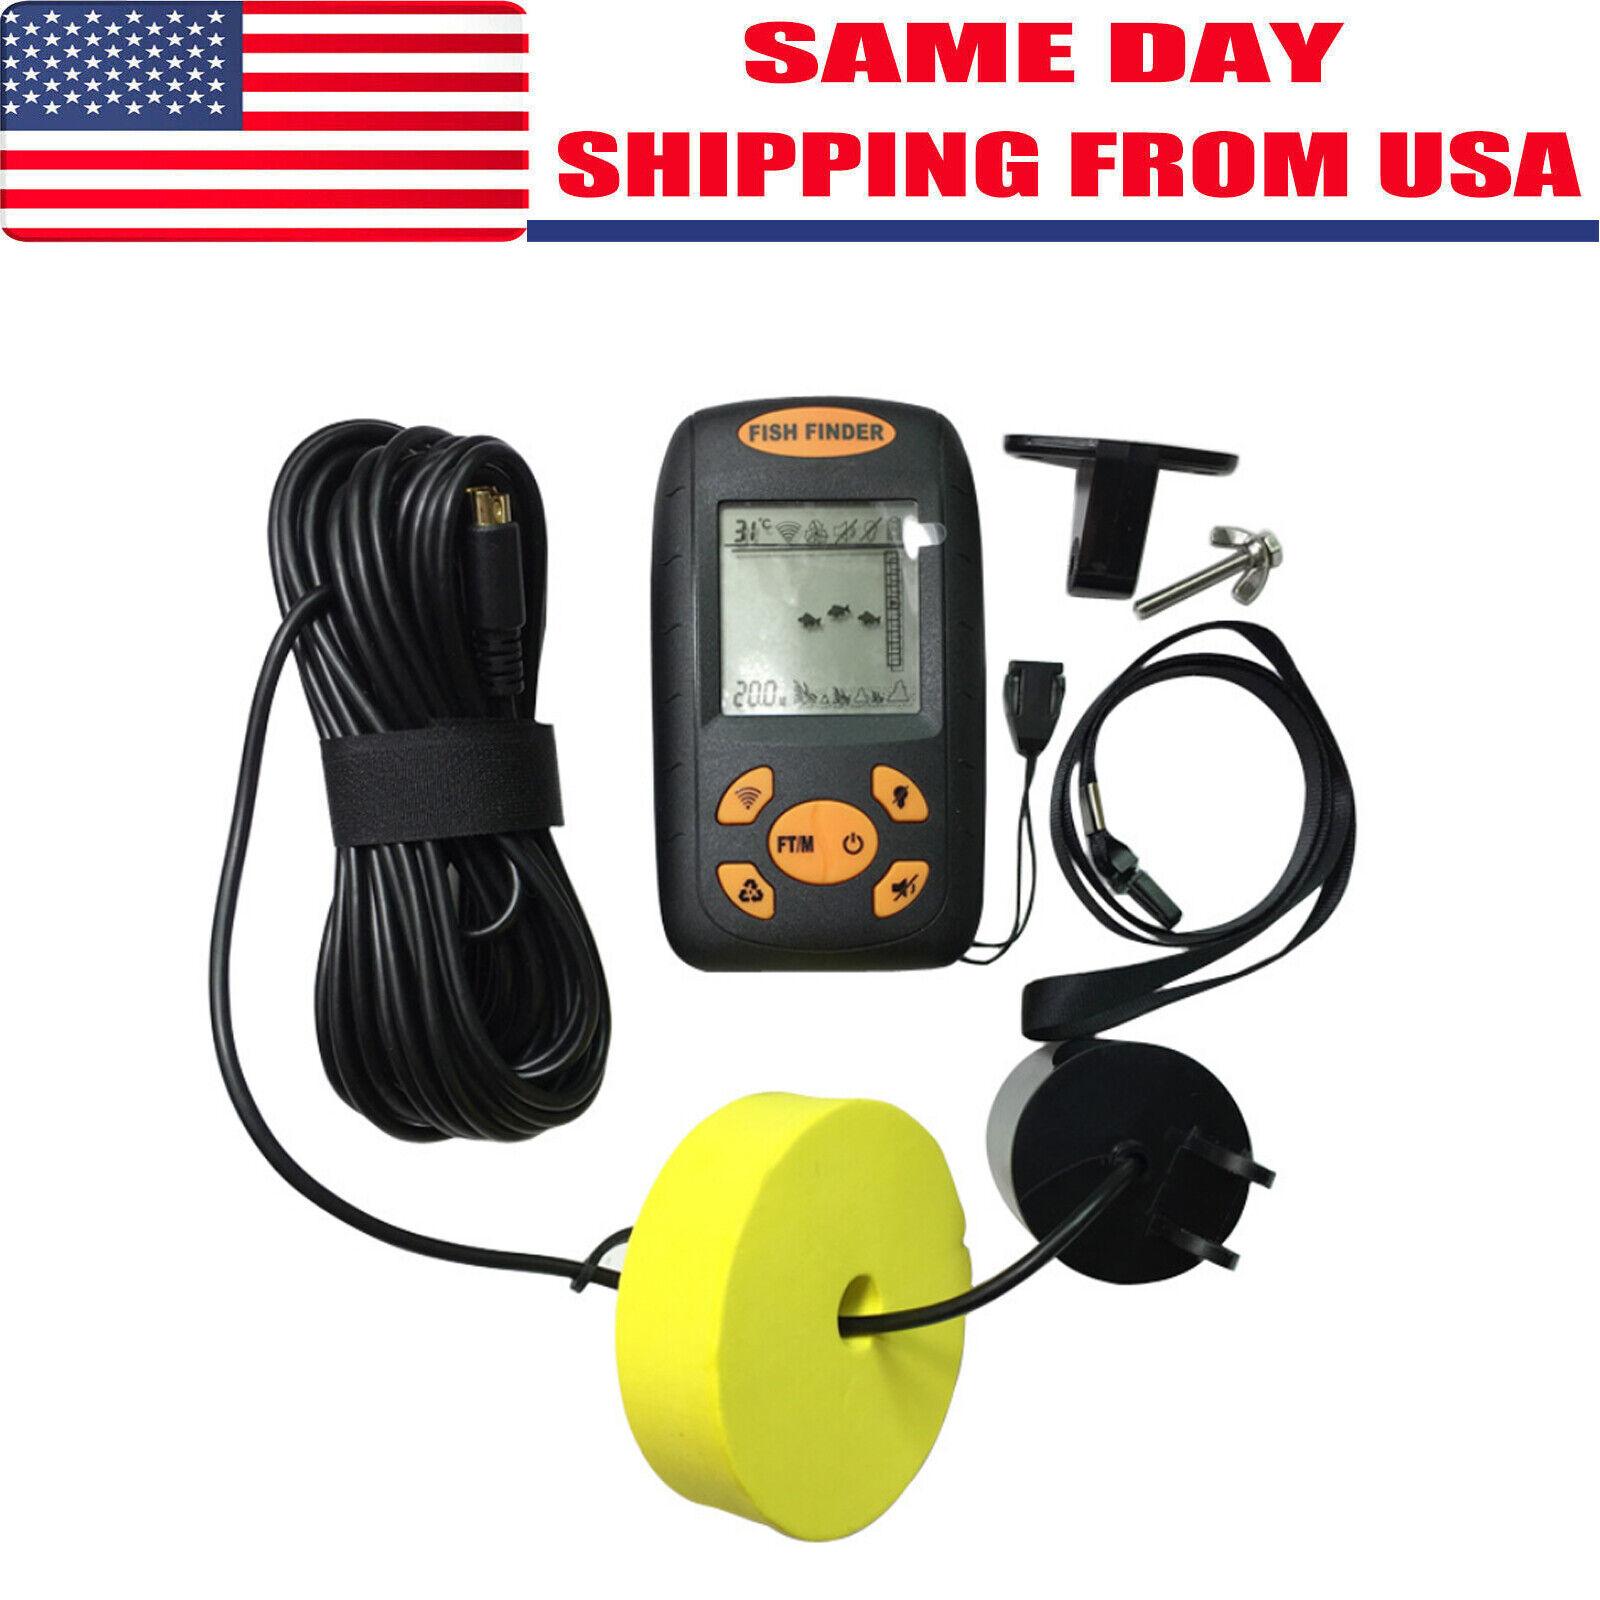 328fts Portable Fish Finder Depth Echo Sonar Alarm Sensor Tr